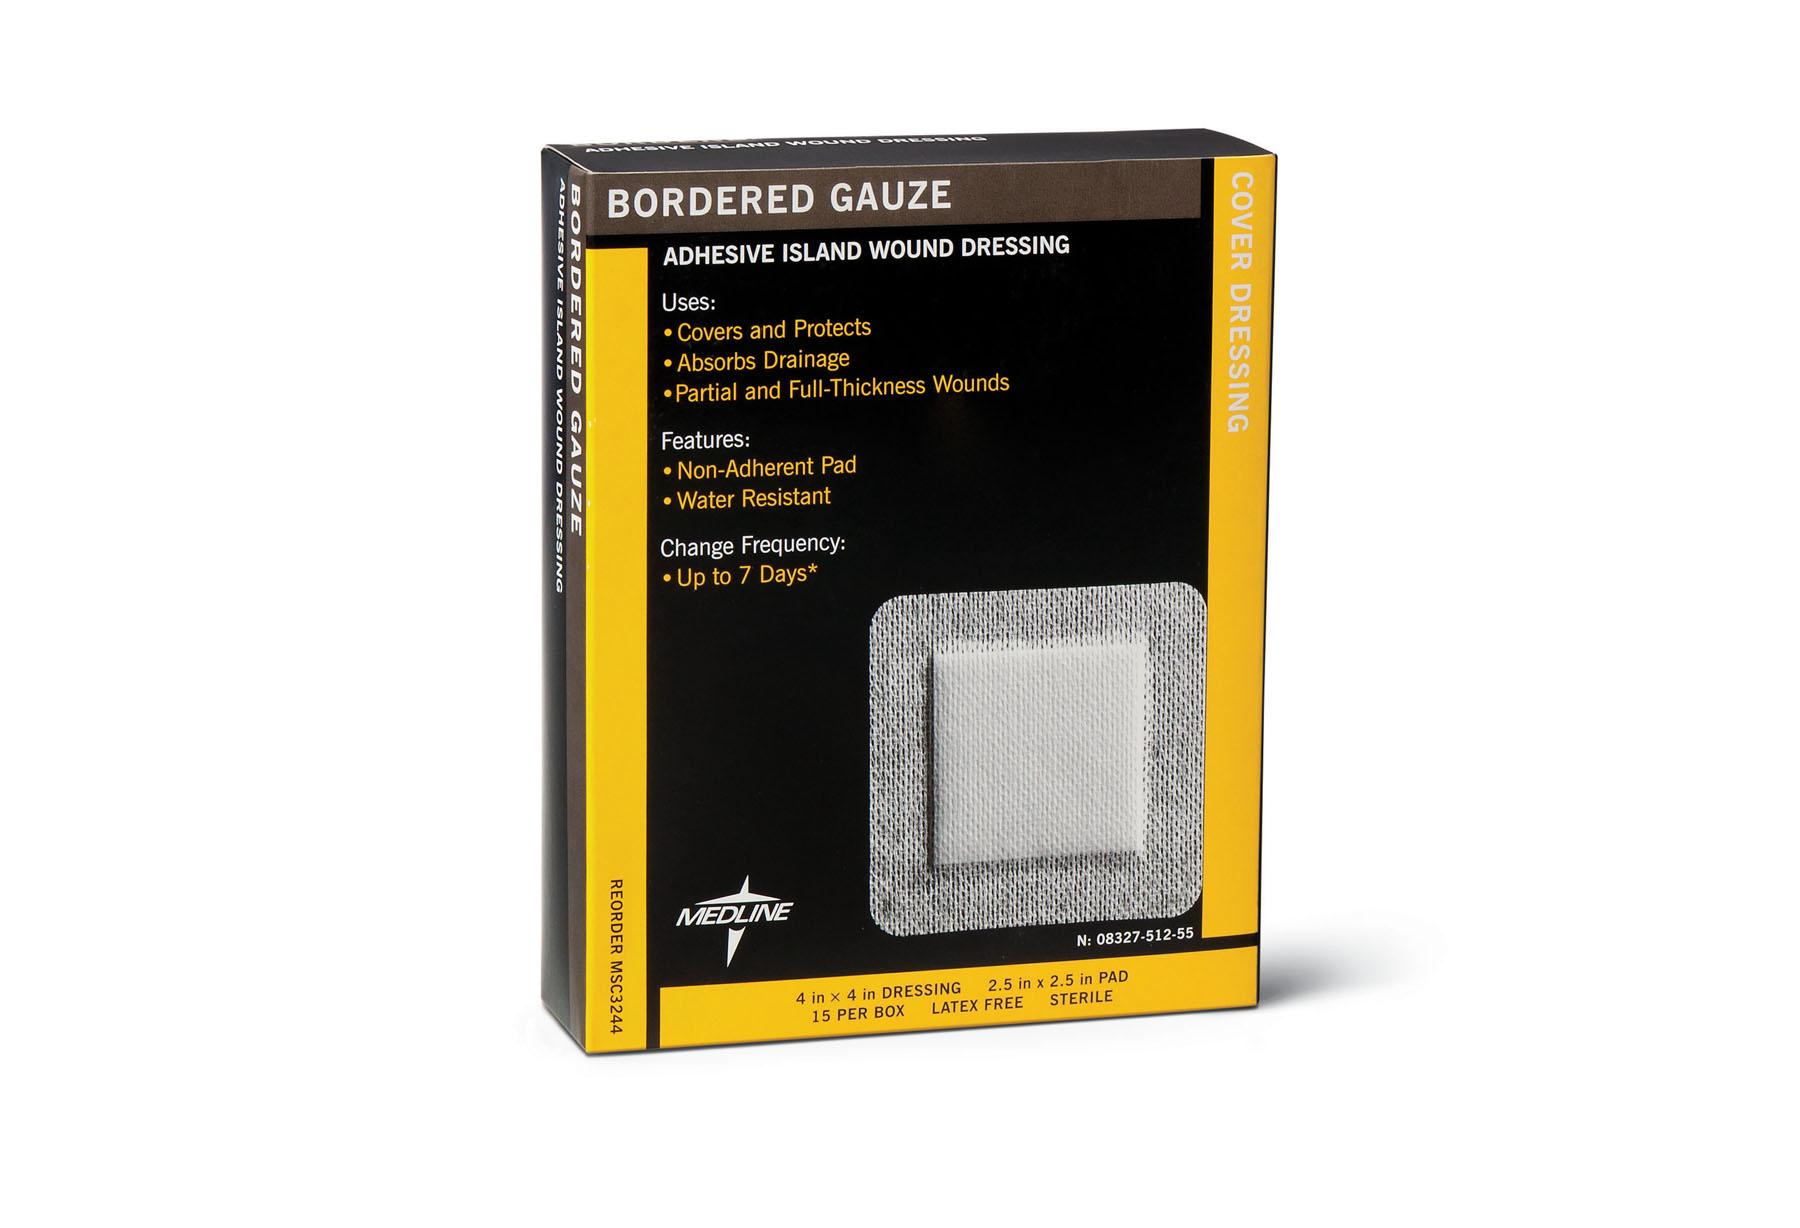 "Image Of Sterile Bordered Gauze 4"" x 4"", 2.5"" x 2.5"" Pad"